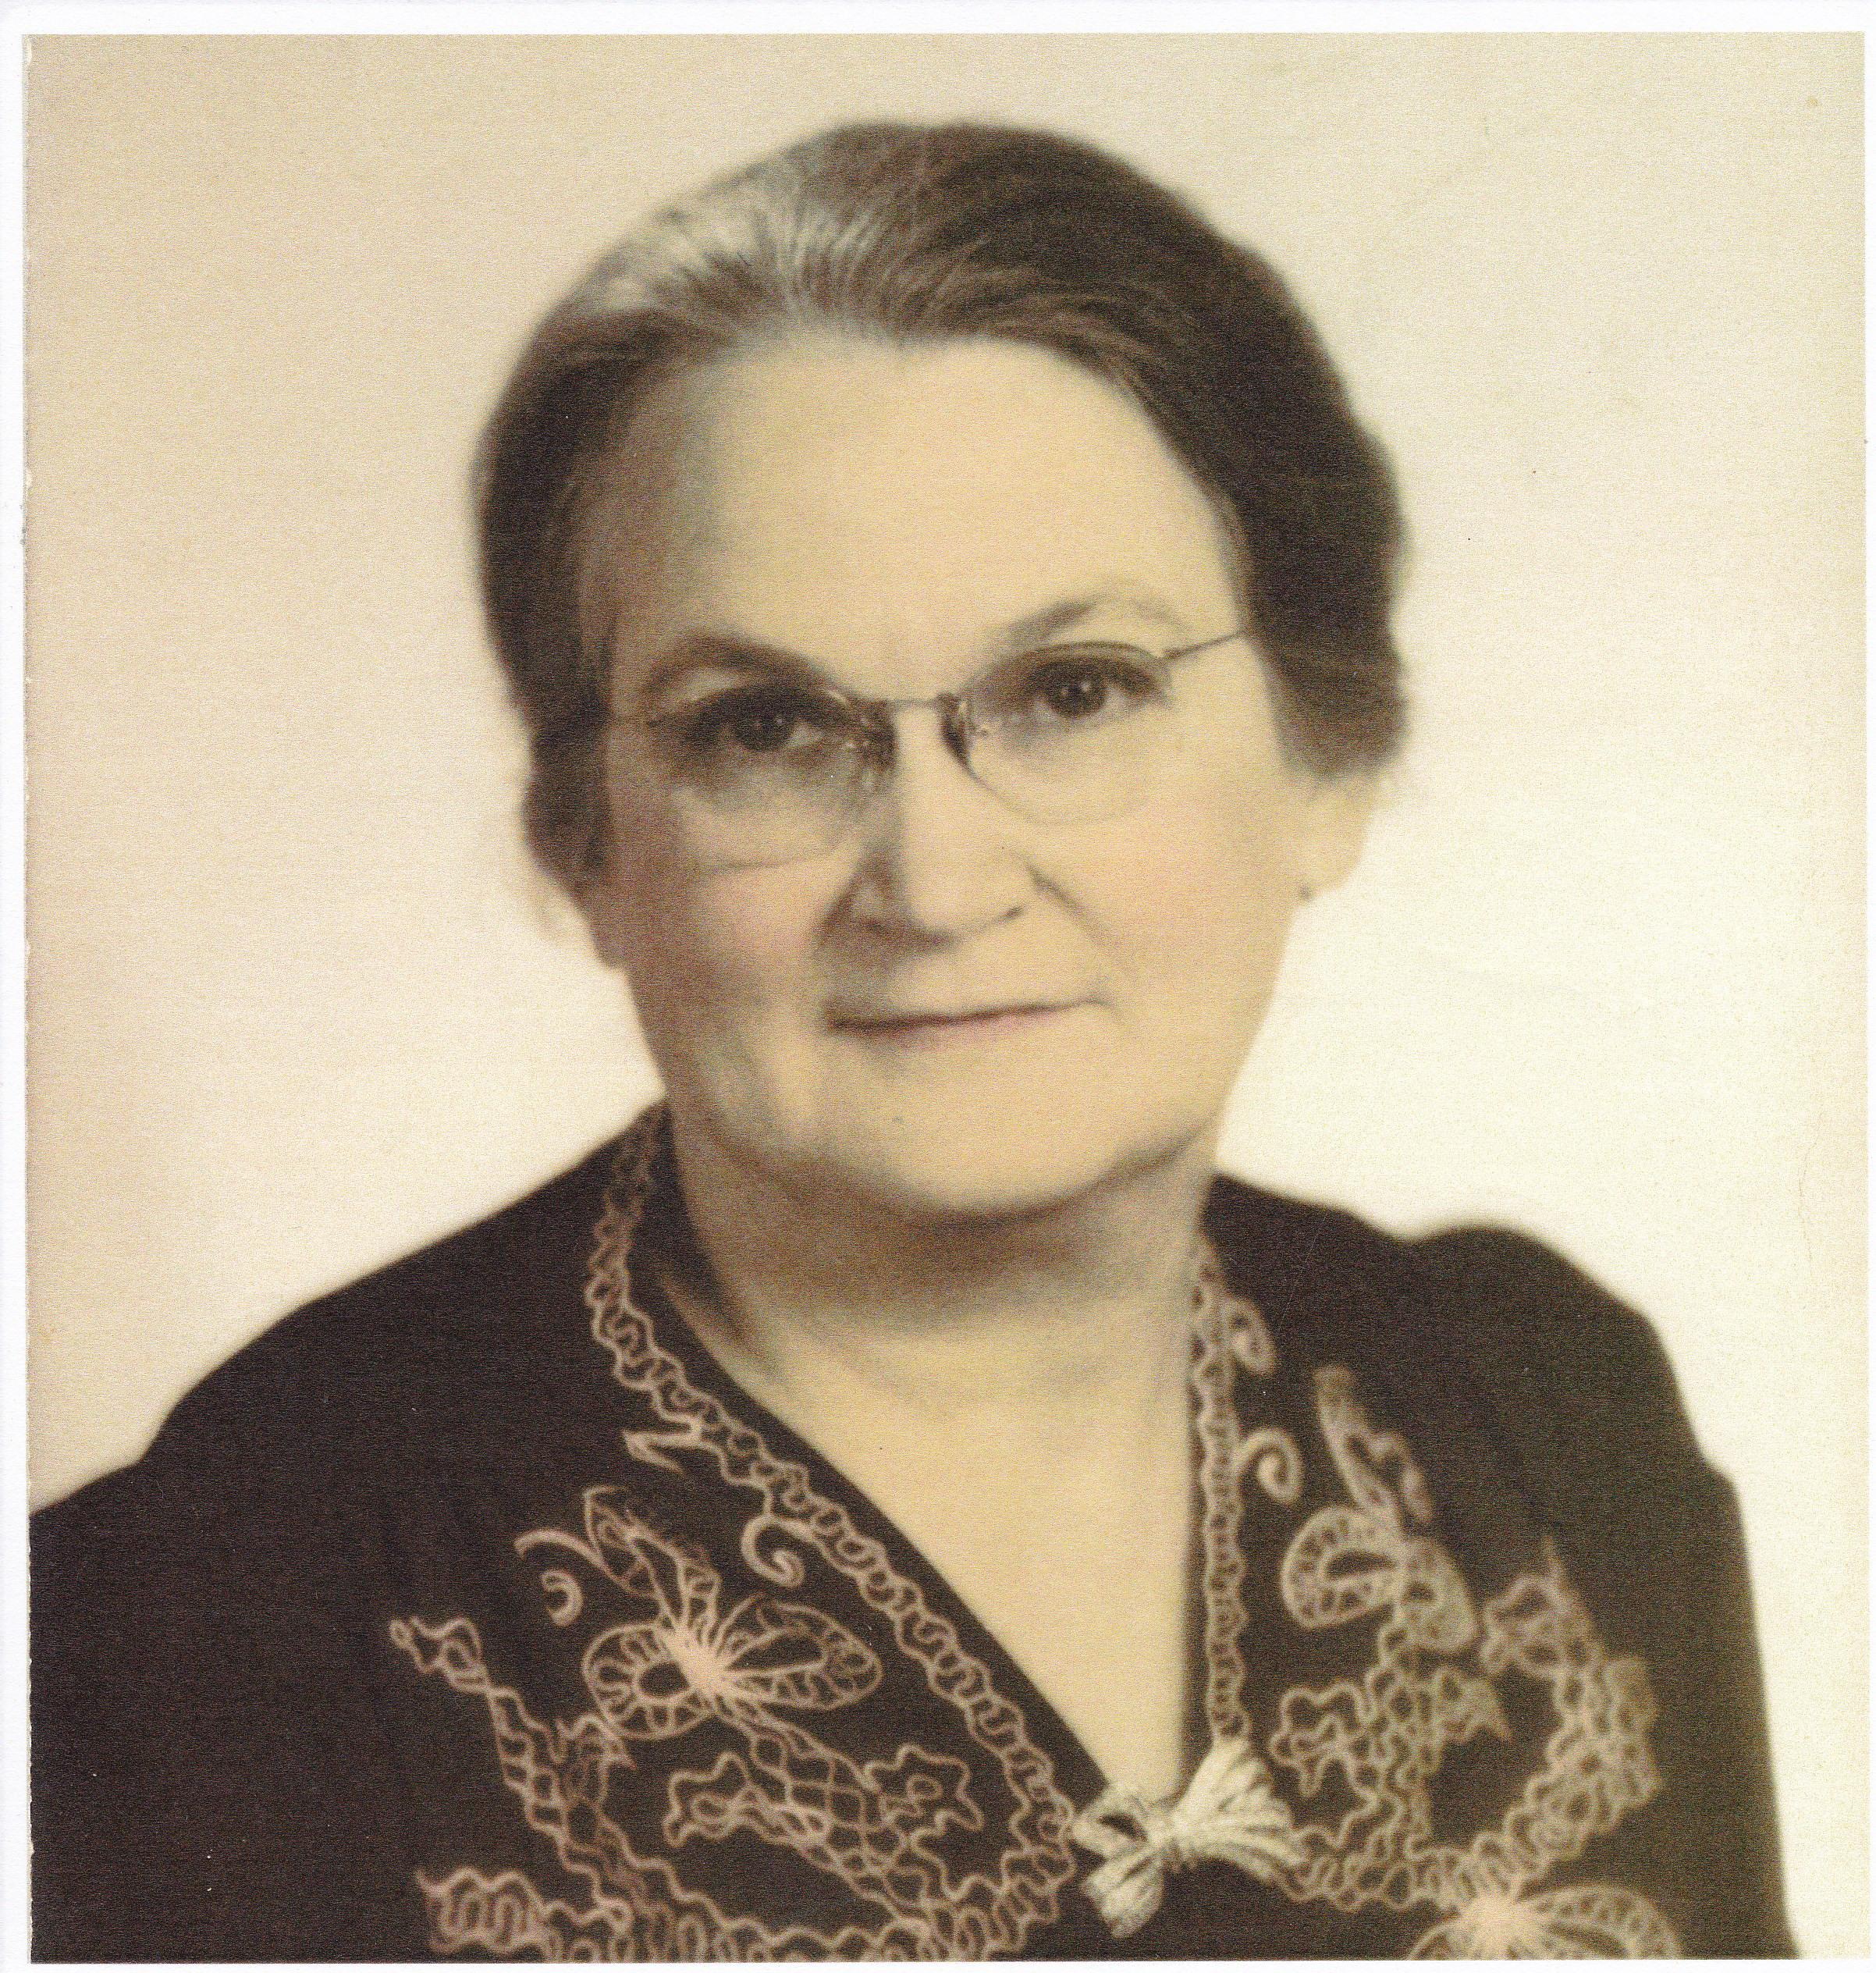 Maggie Coxwell